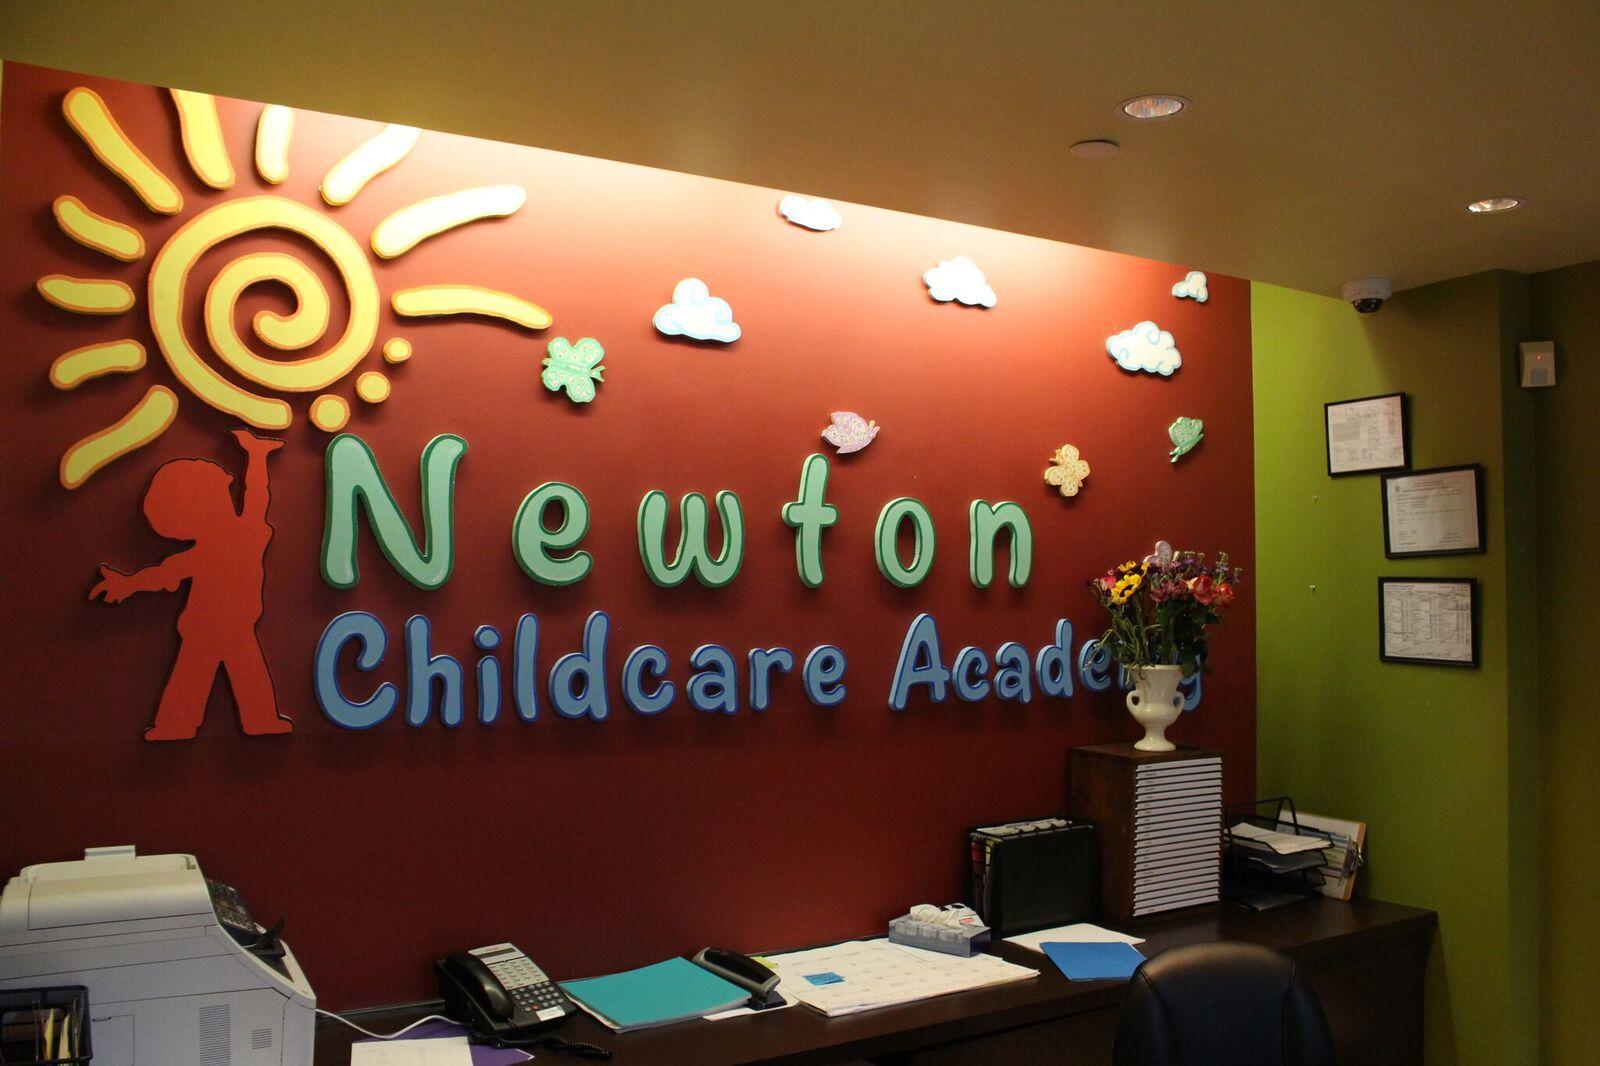 Newton Childcare Academy image 0